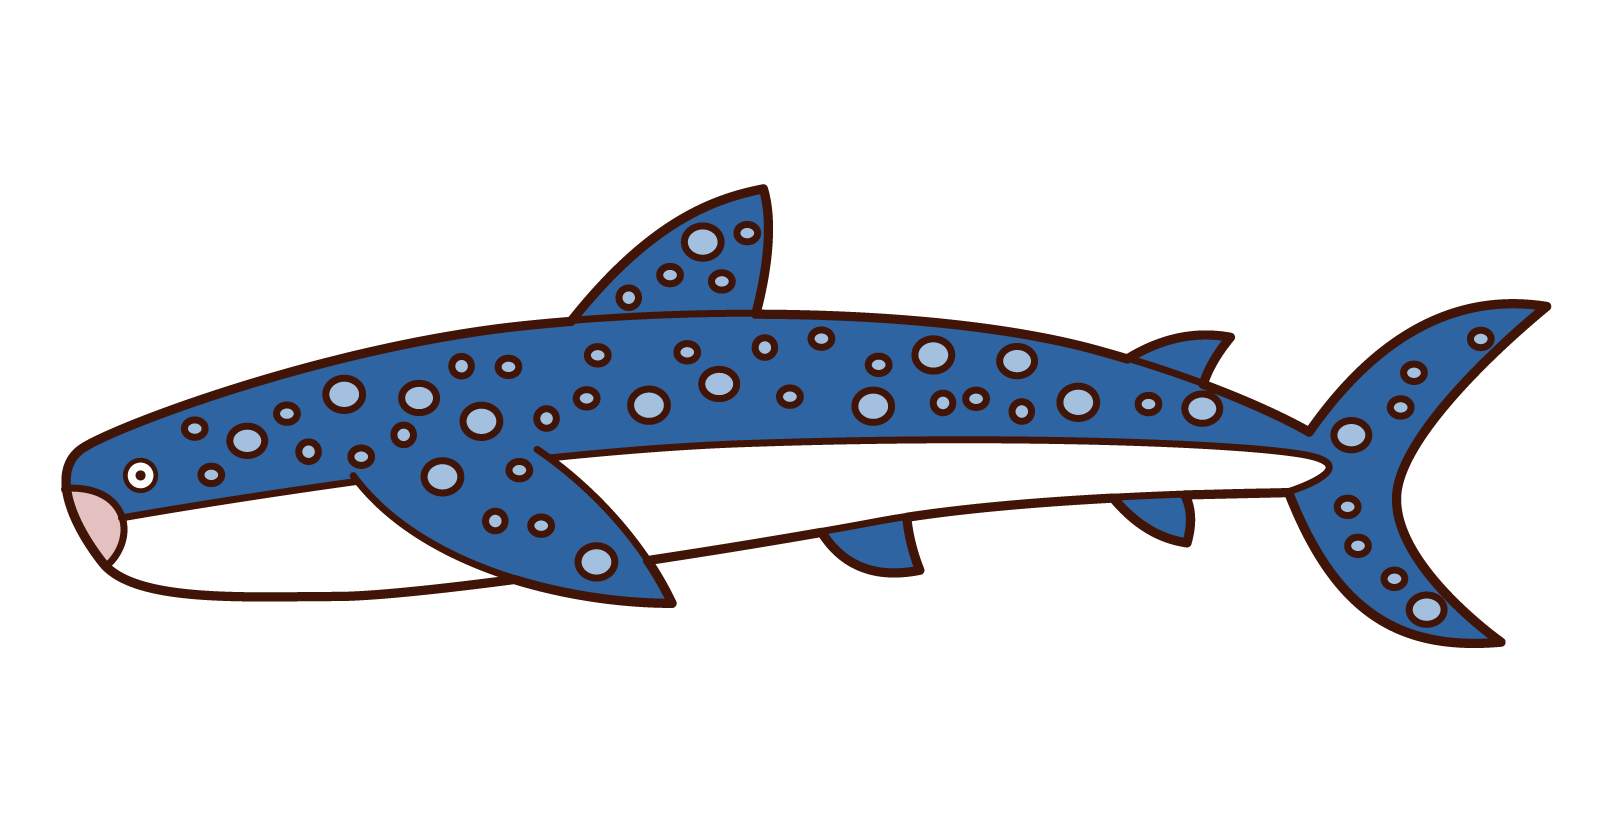 Illustration of whale shark